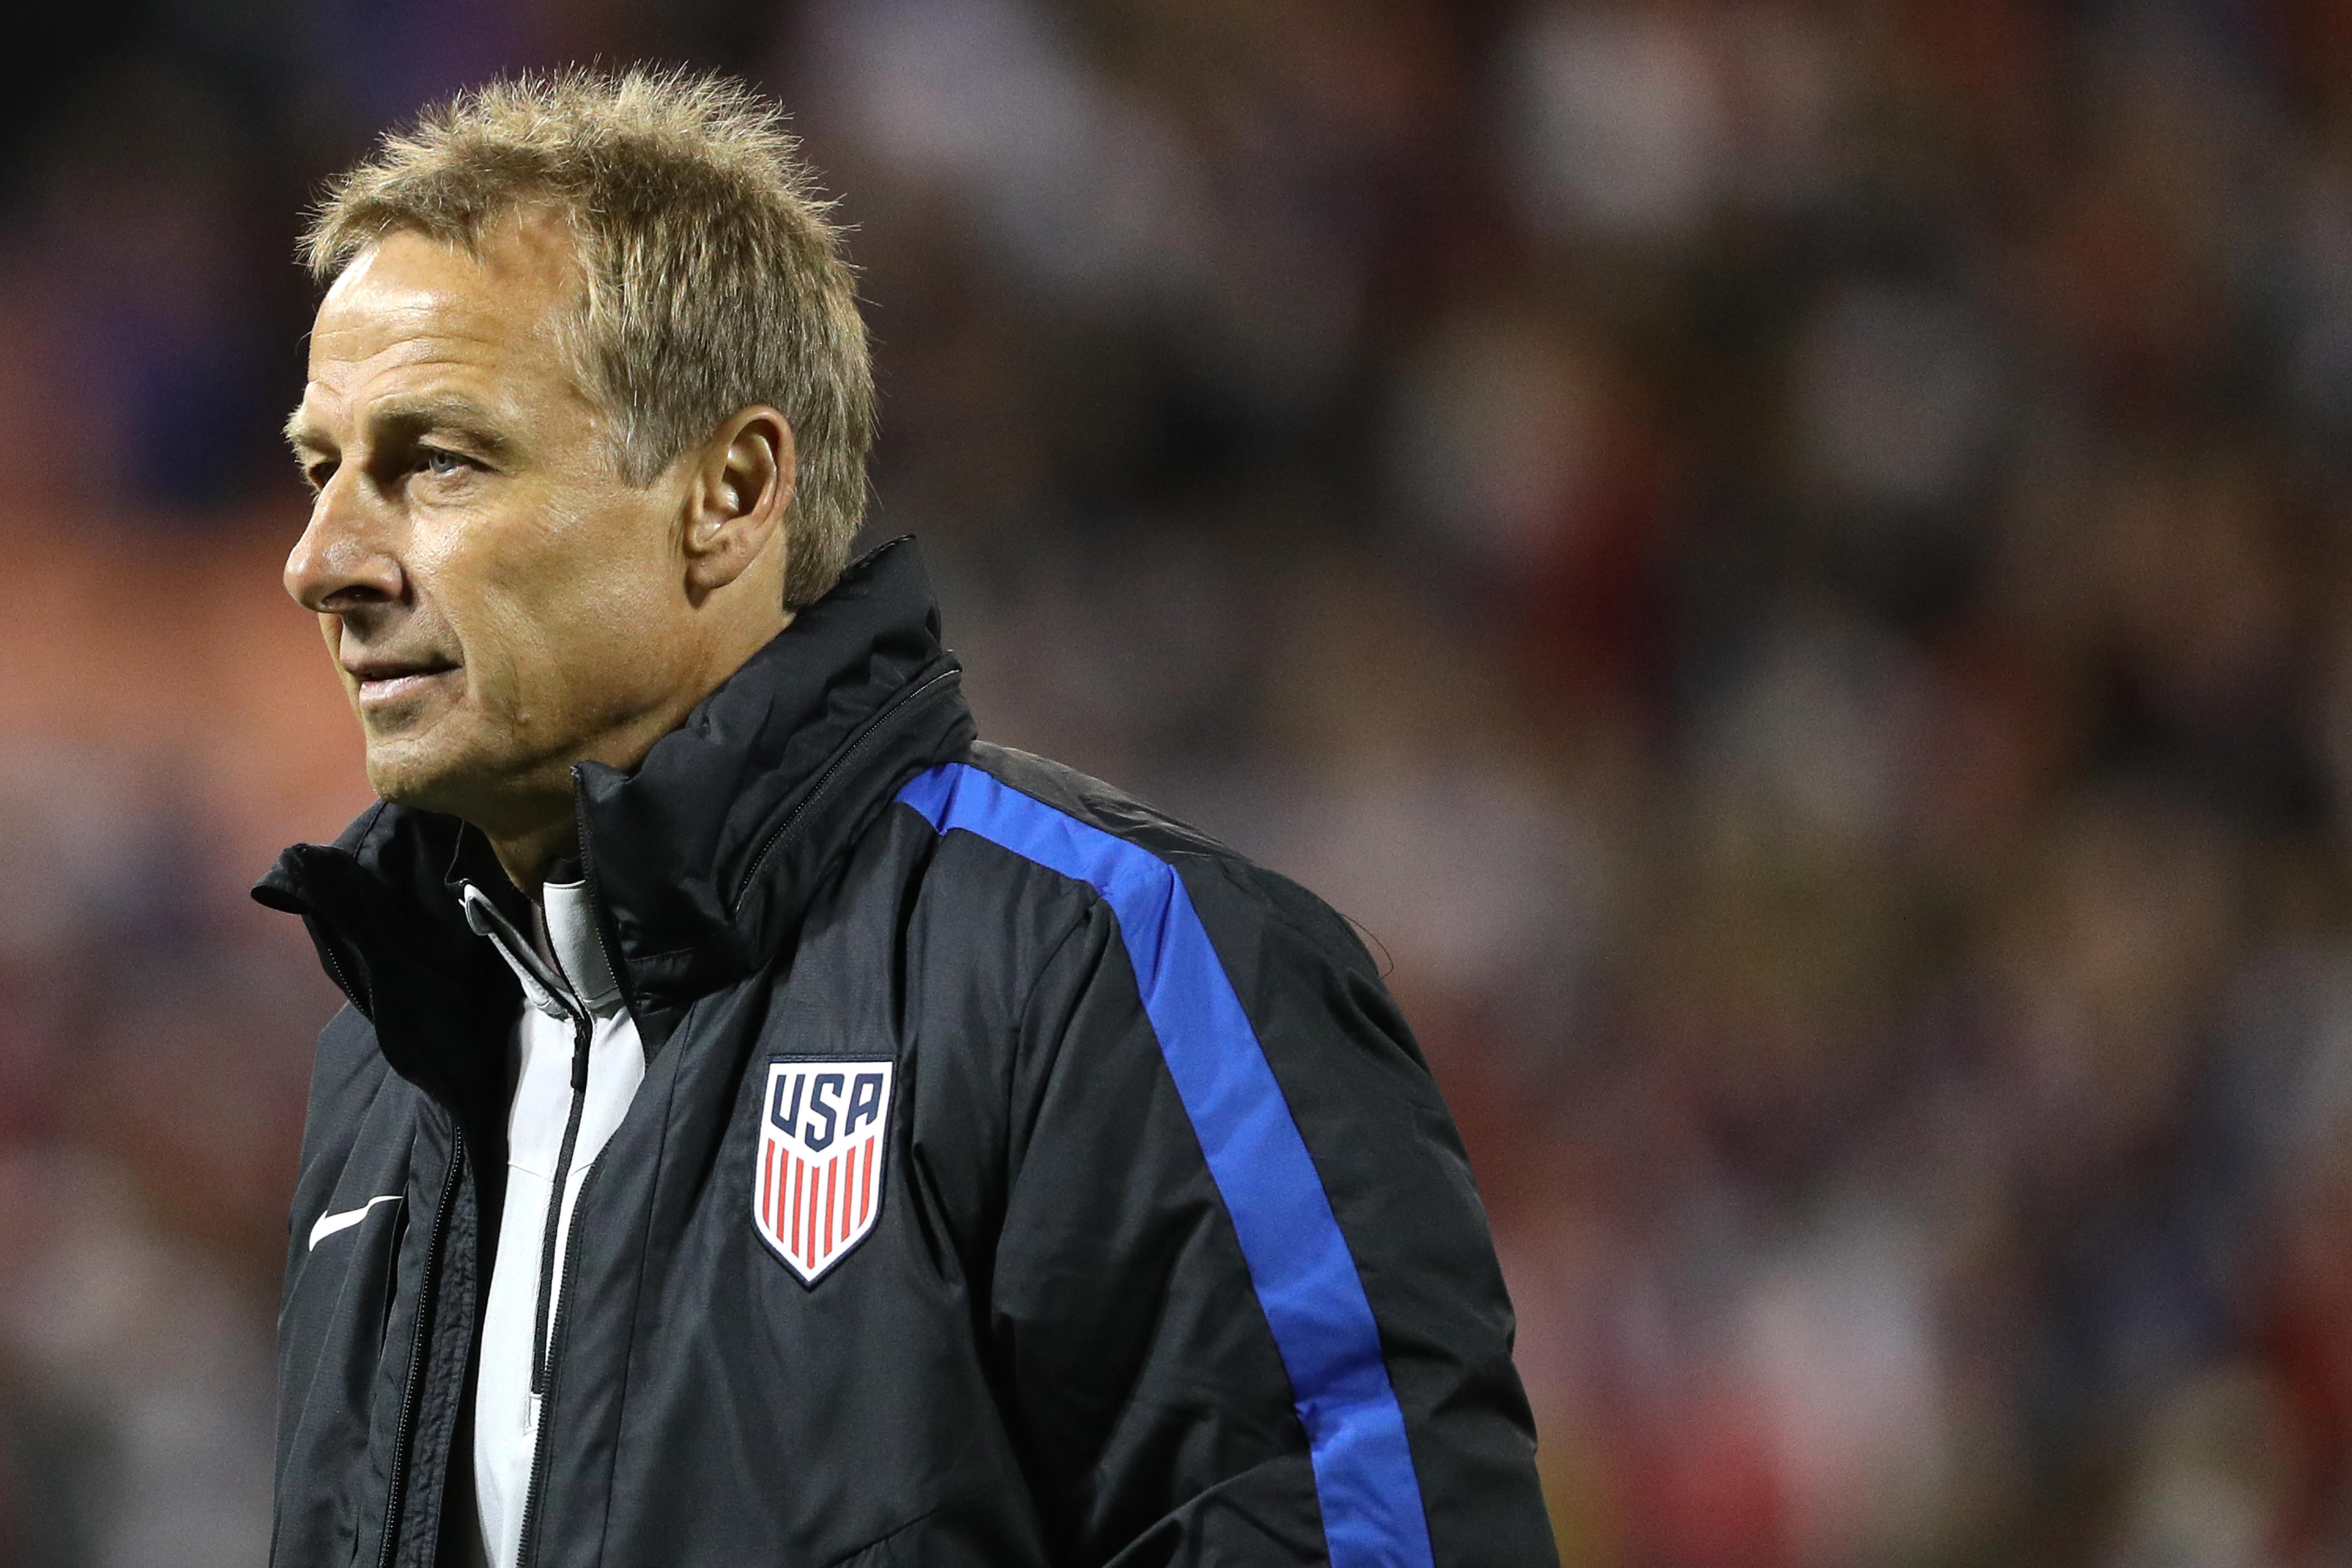 Ex-U.S. soccer head coach Jurgen Klinsmann looks on after playing against New Zealand during an International Friendly at RFK Stadium on October 11, 2016 in Washington, DC.